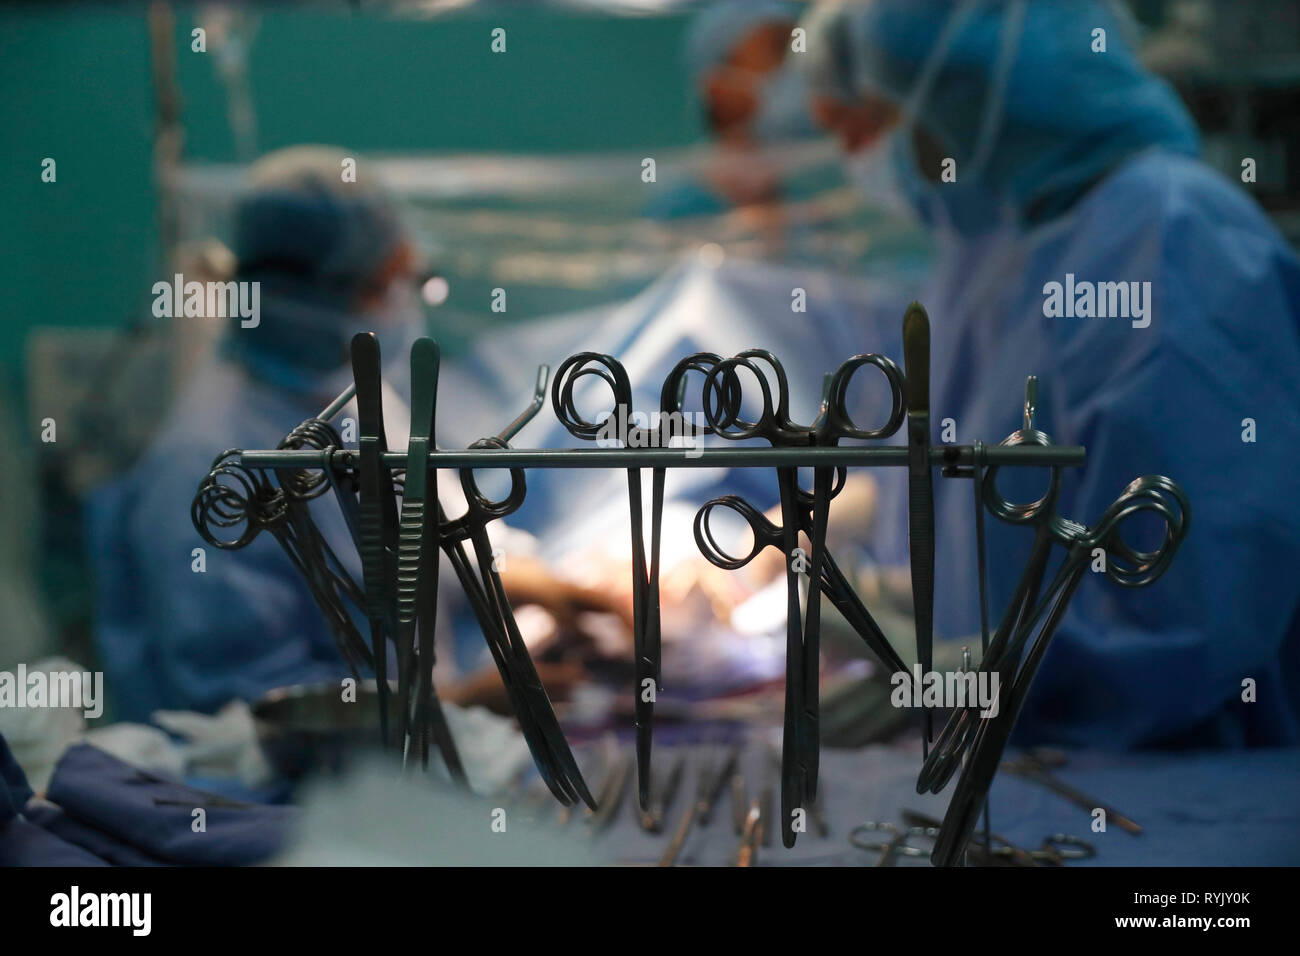 Tam Duc Cardiology Hospital. Operating theater. Cardiac surgery.  Ho Chi Minh City. Vietnam. - Stock Image